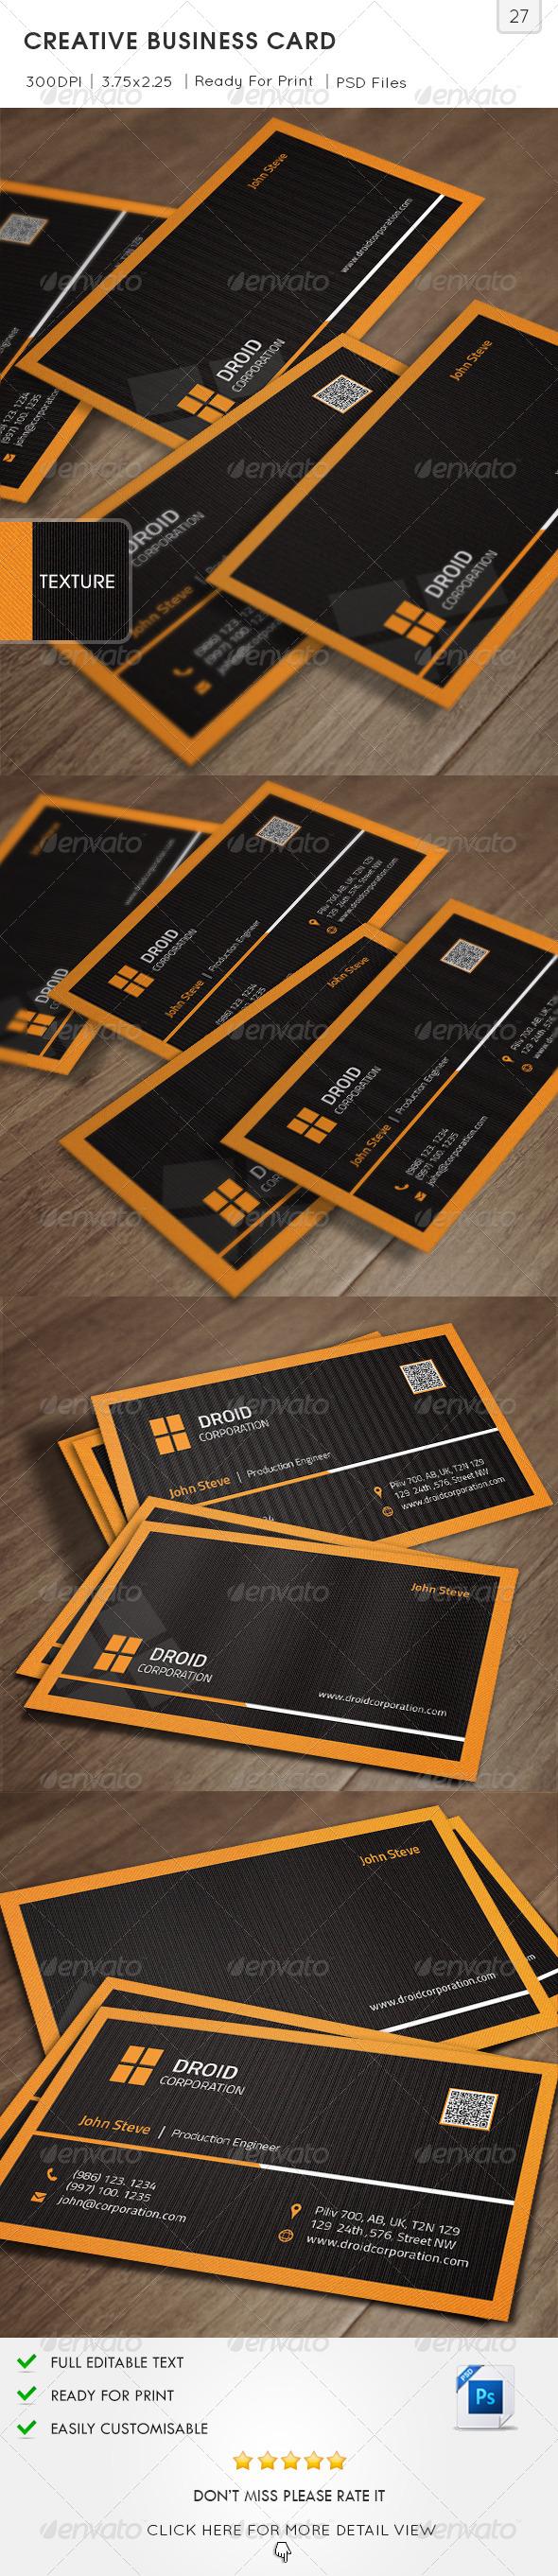 Creative Business Card v27 - Creative Business Cards